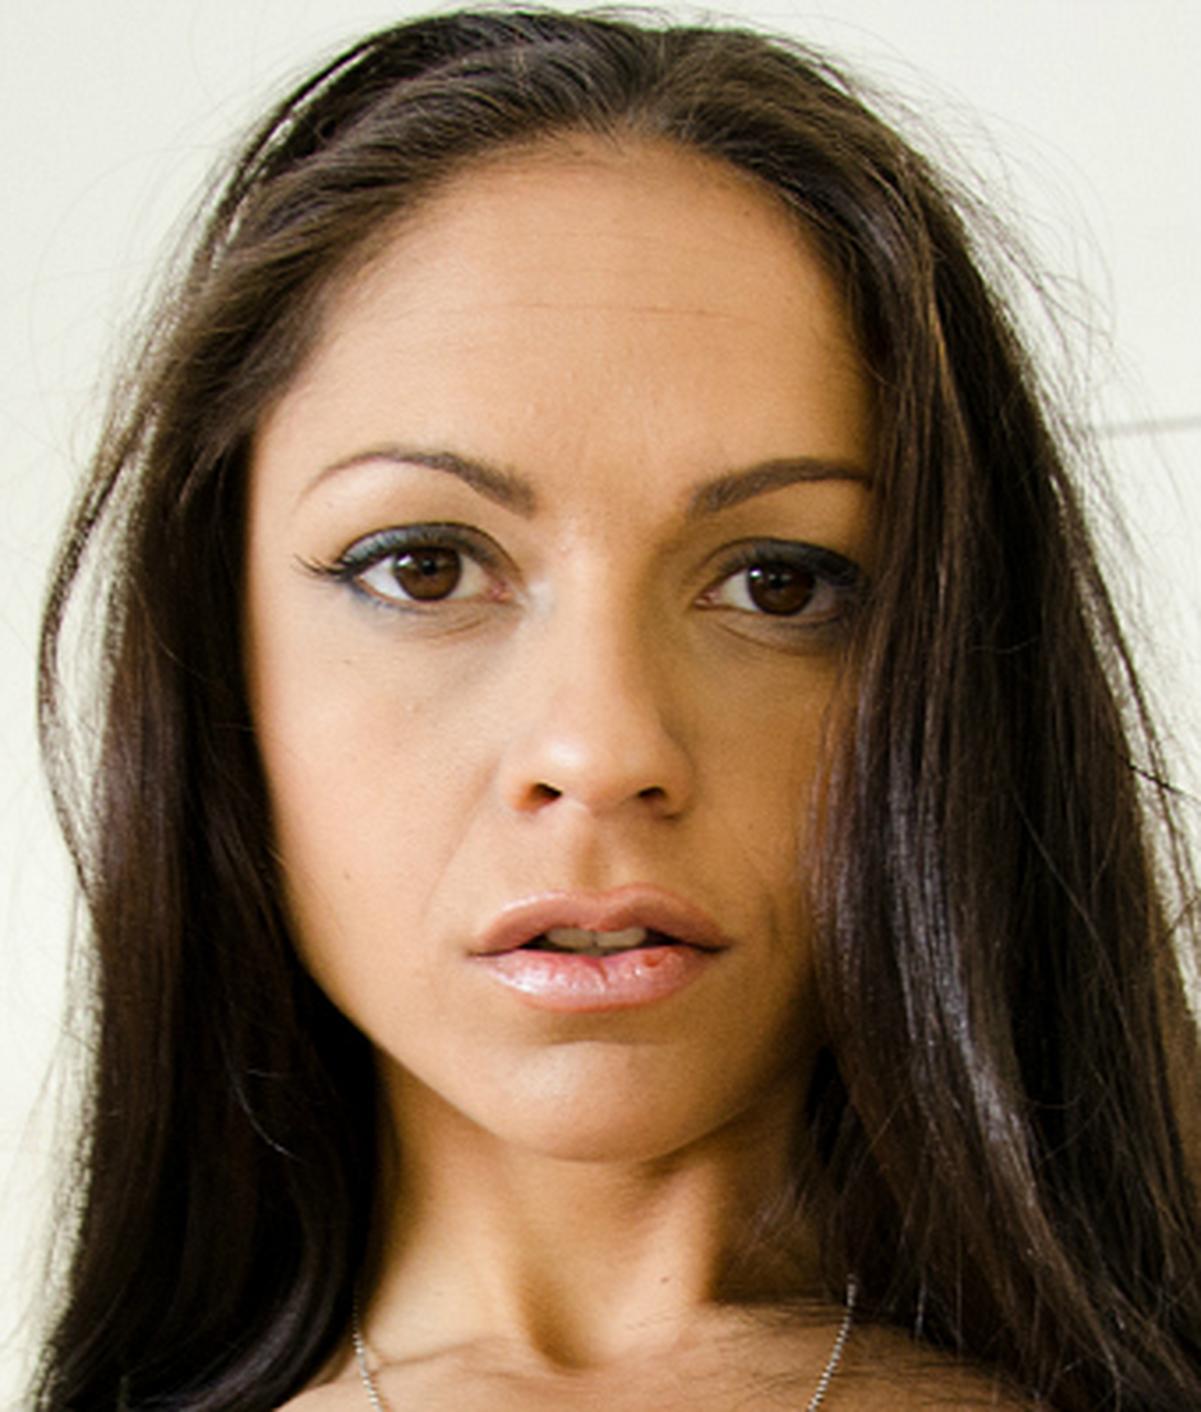 Actriz Porno Marta showing porn images for alexandra sivroskya marta la porn